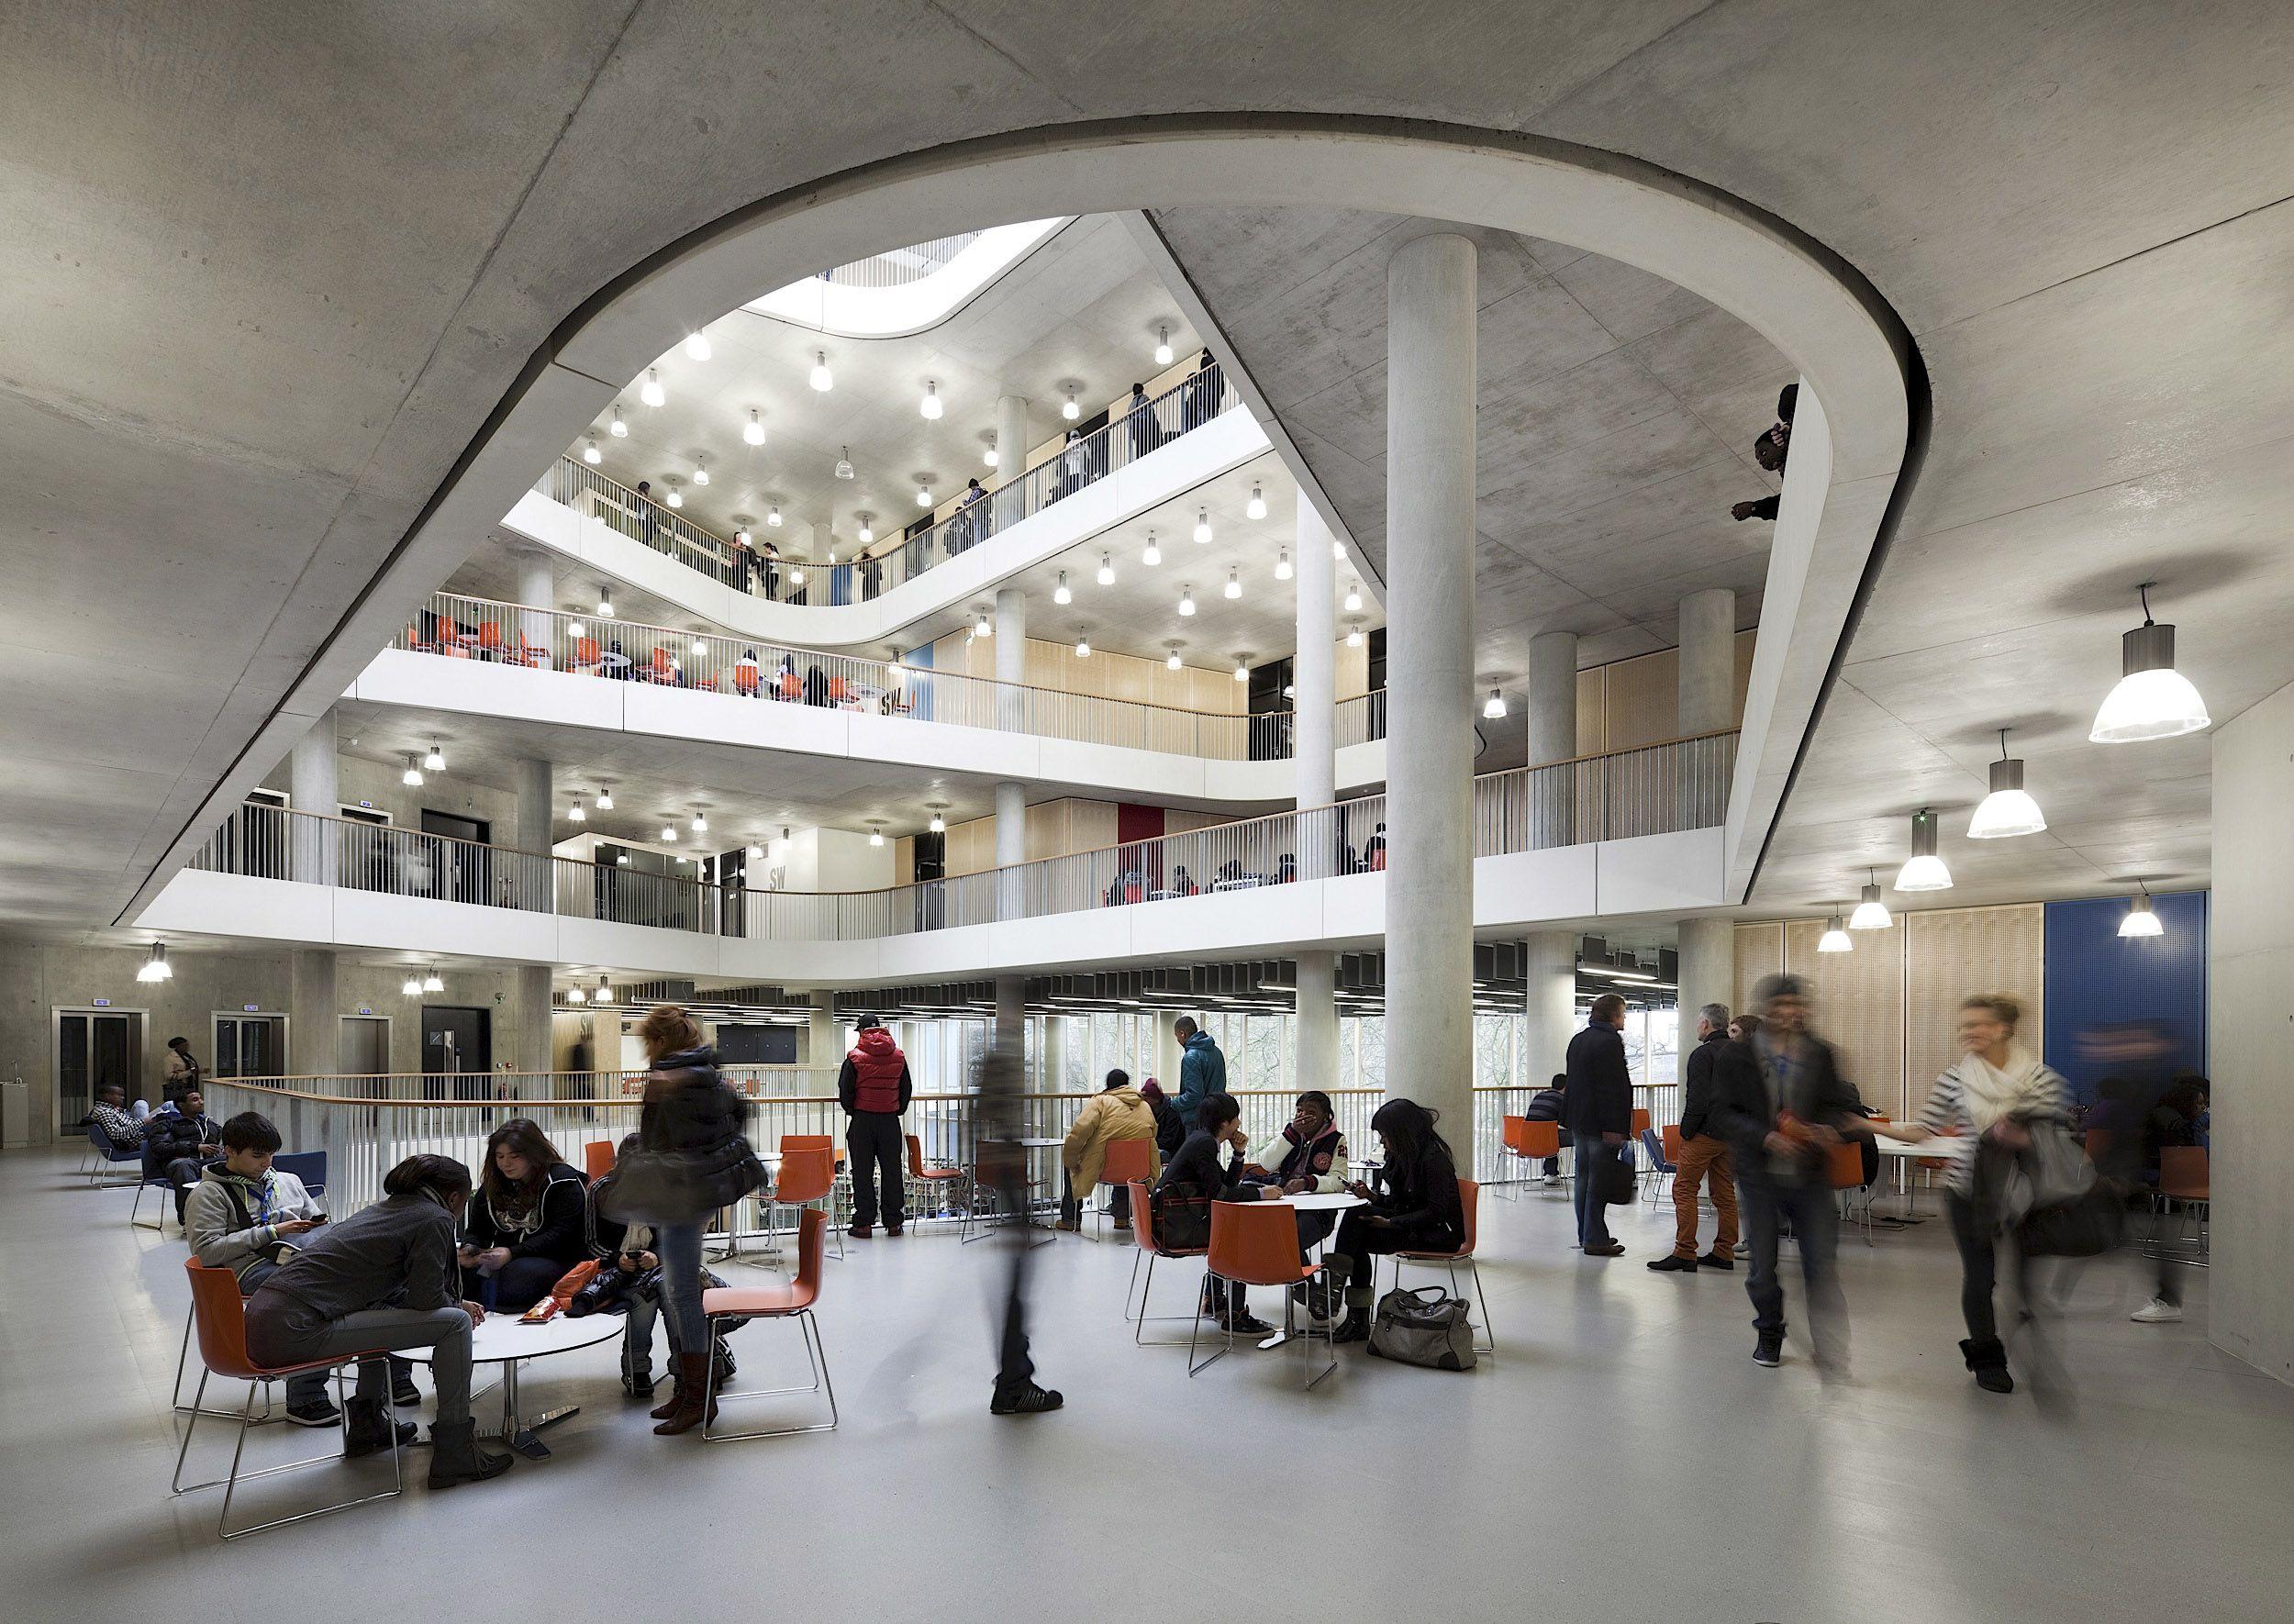 City Of Westminster College London United Kingdom Schmidt Hammer Lassen Architects Photo Adam Mork City Of Westminster College Westminster Architects London